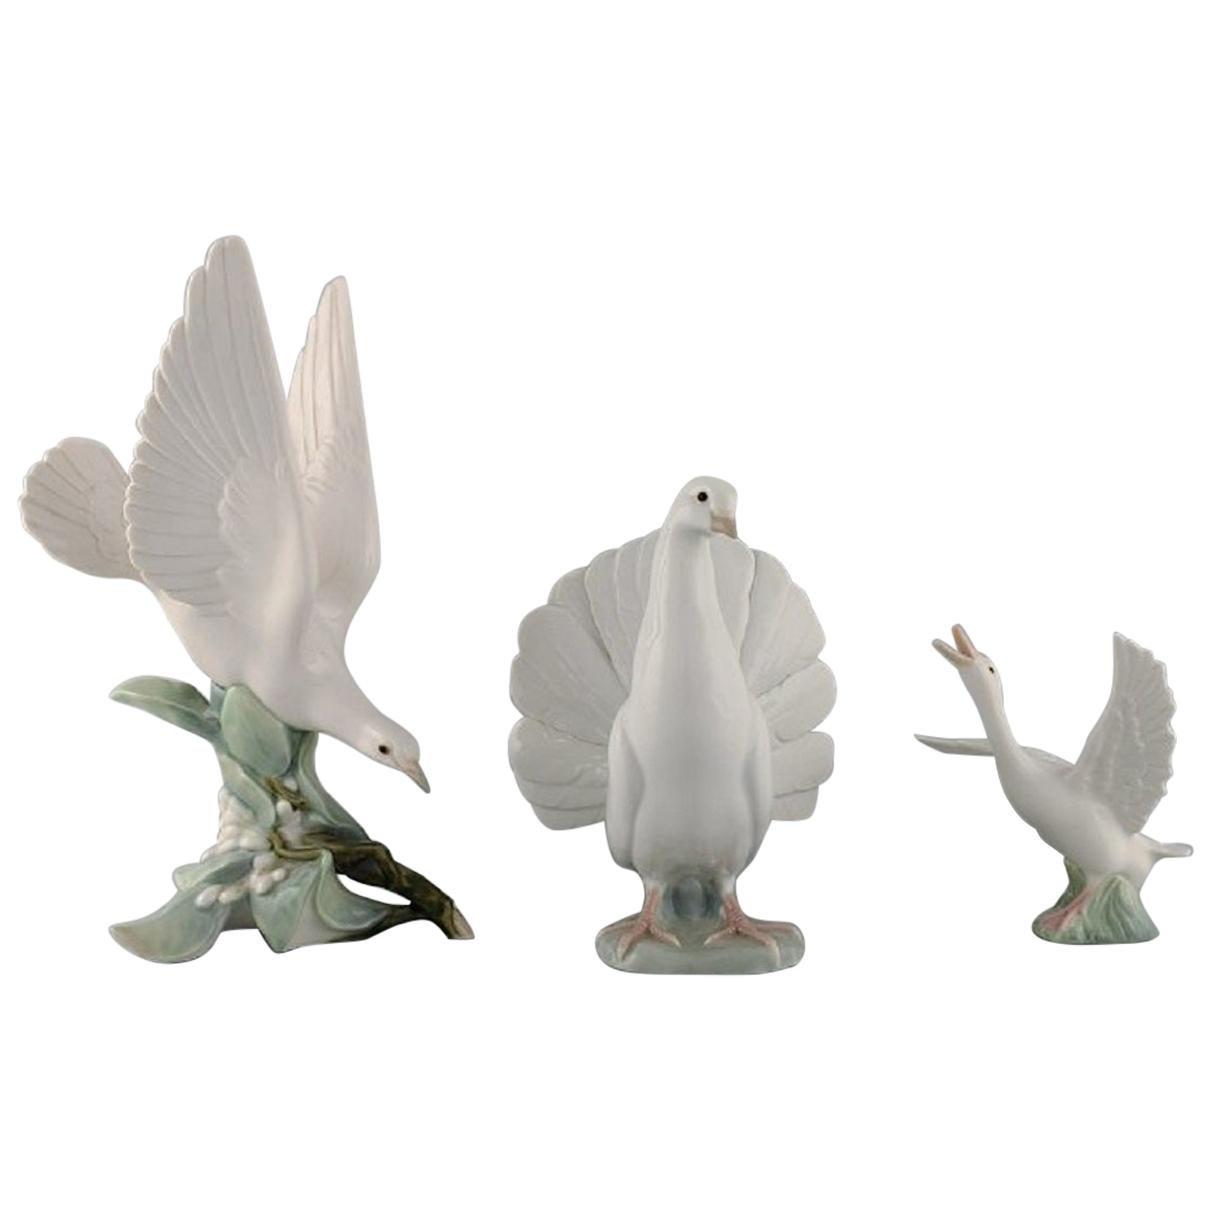 Lladro, Spain, Three Porcelain Figurines, Birds, 1970s-1980s